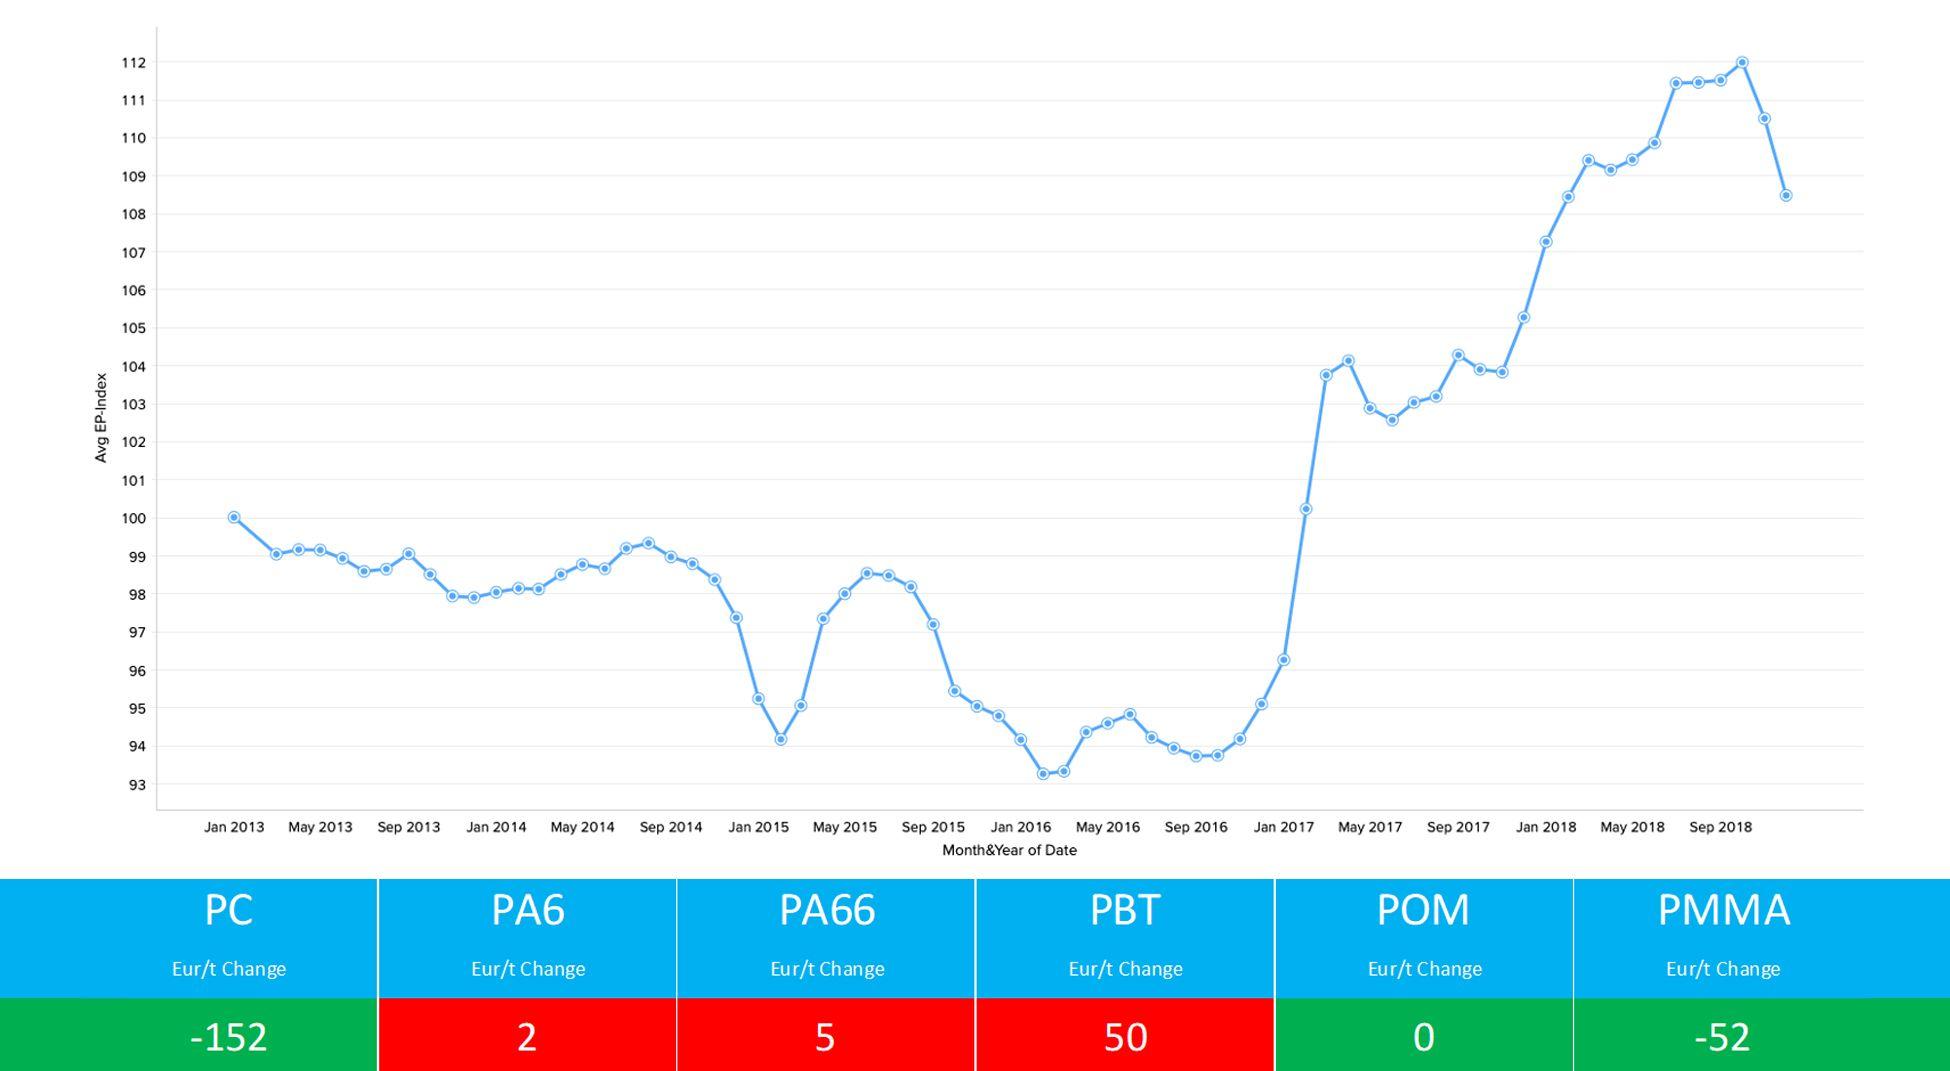 polymer pricing engineering thermoplastics